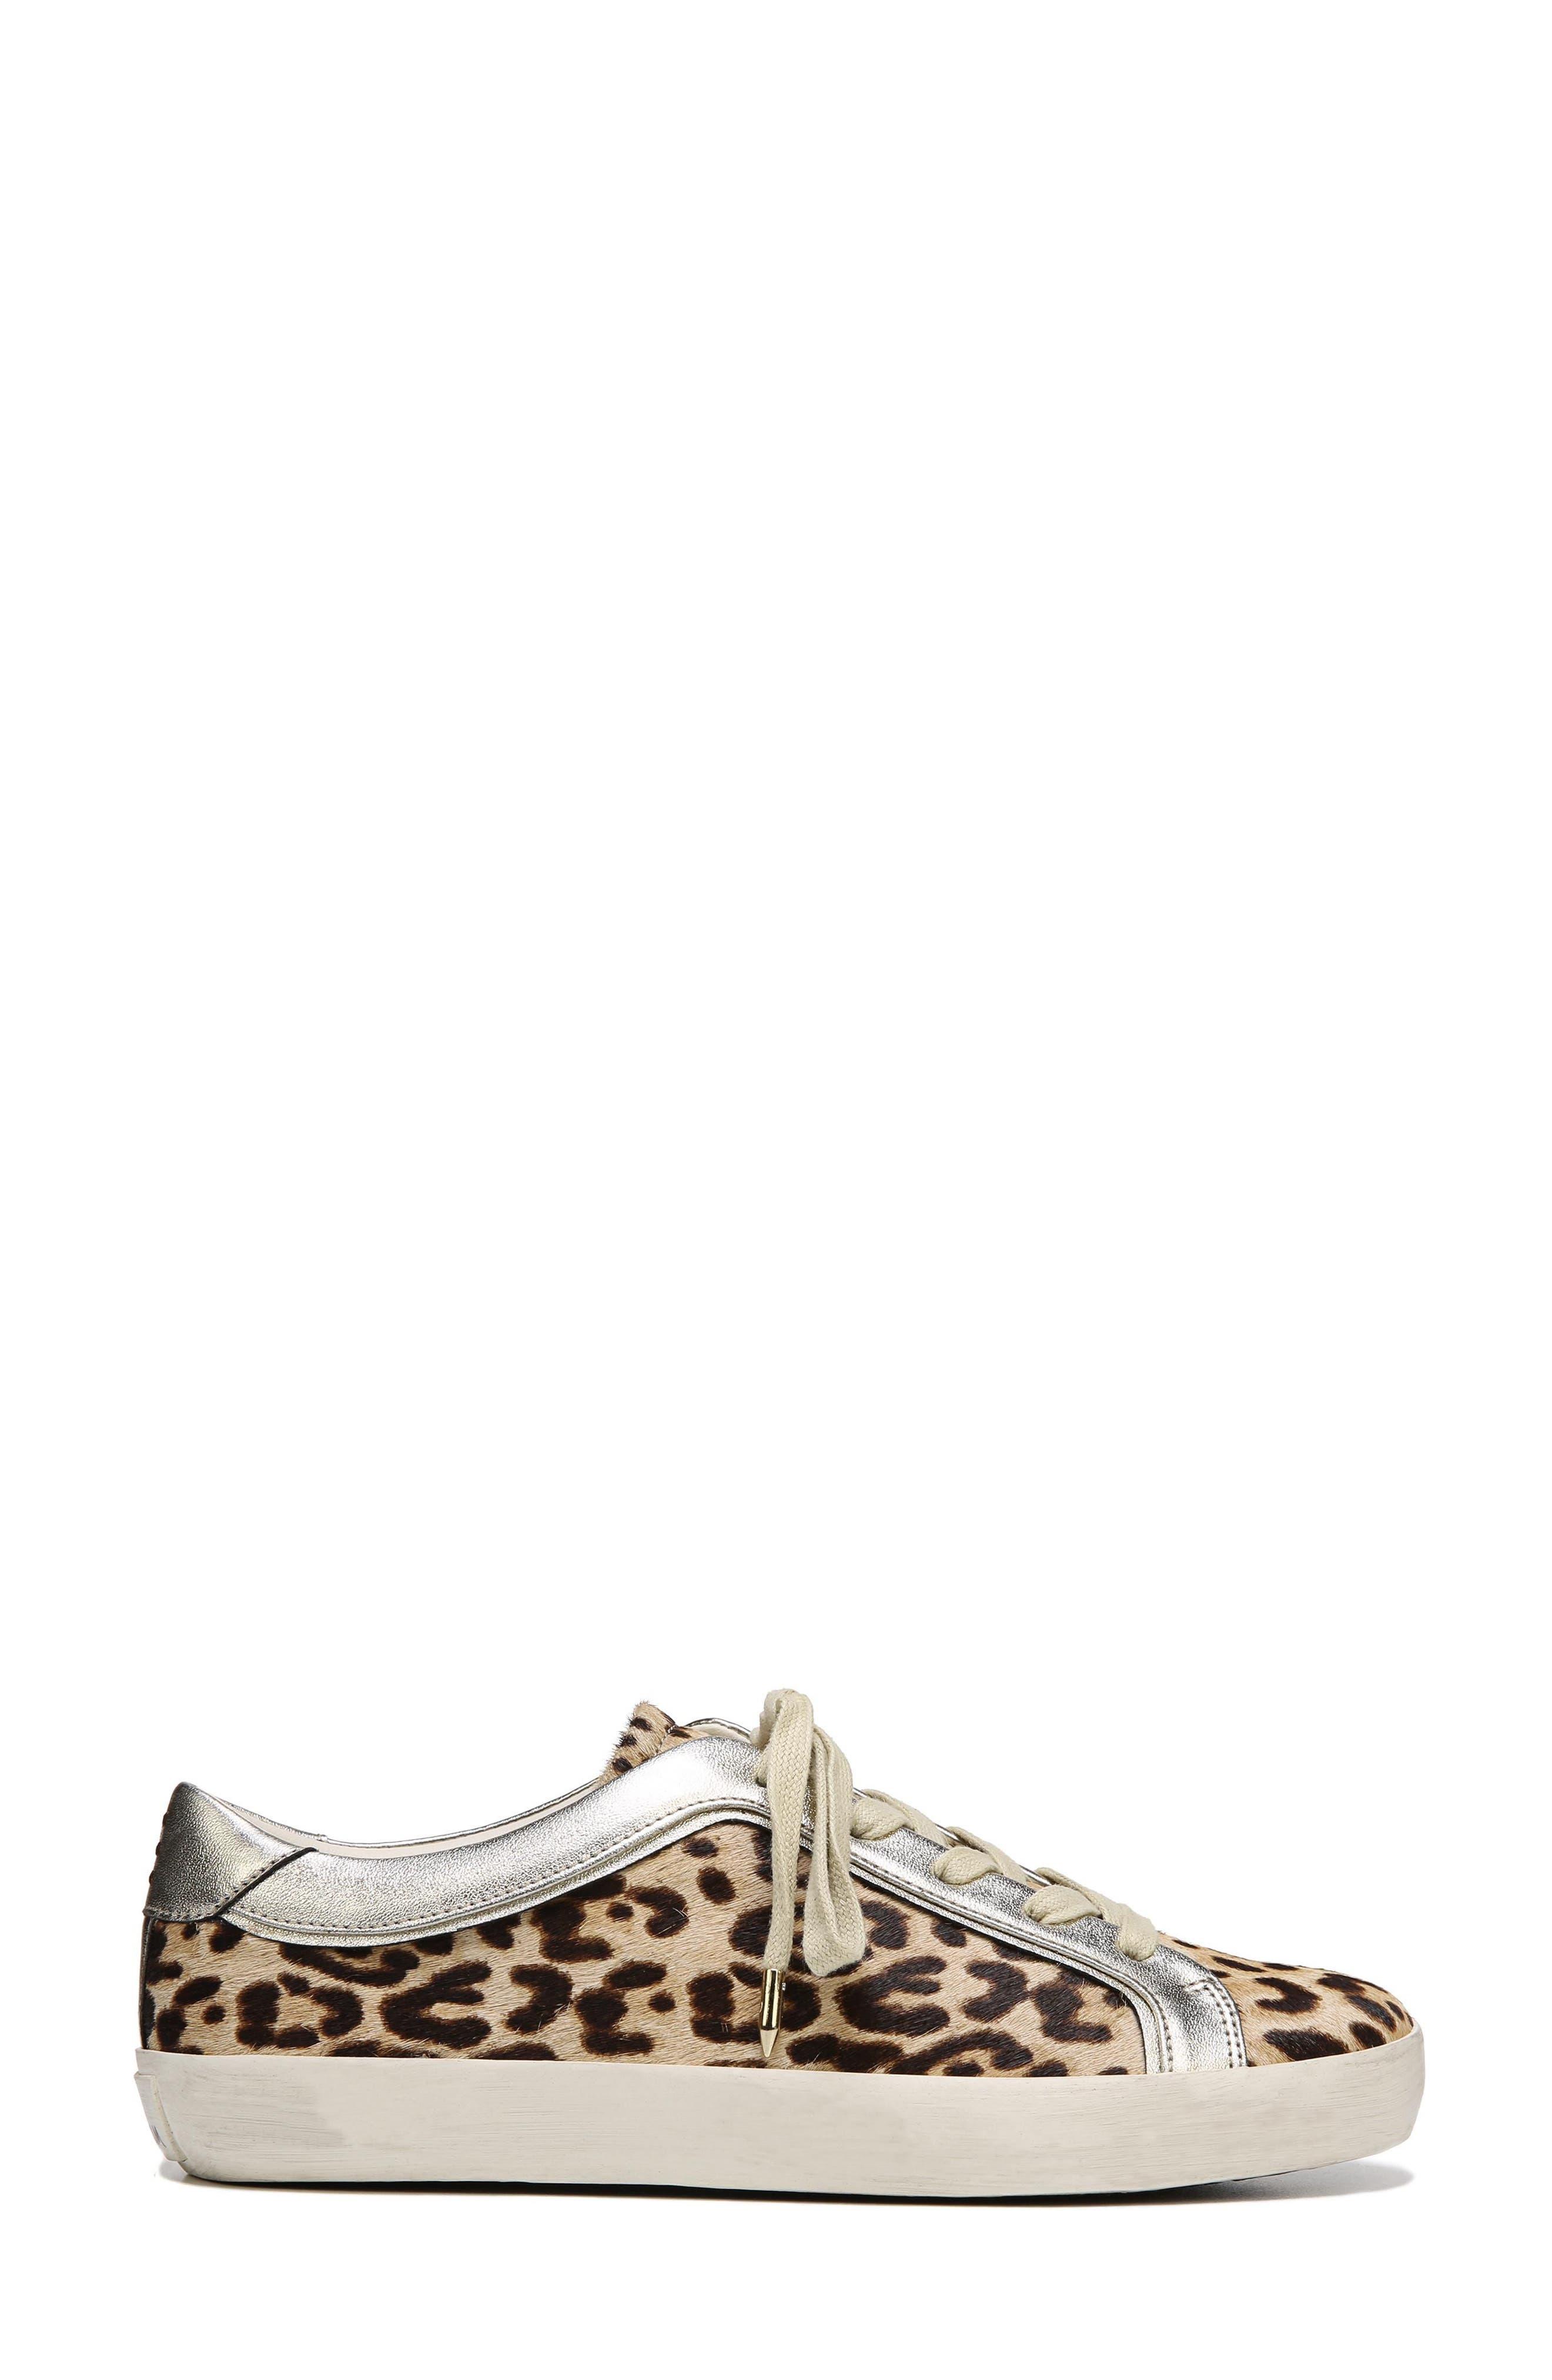 Britton 2 Sneaker,                             Alternate thumbnail 3, color,                             Leopard Brahma Hair